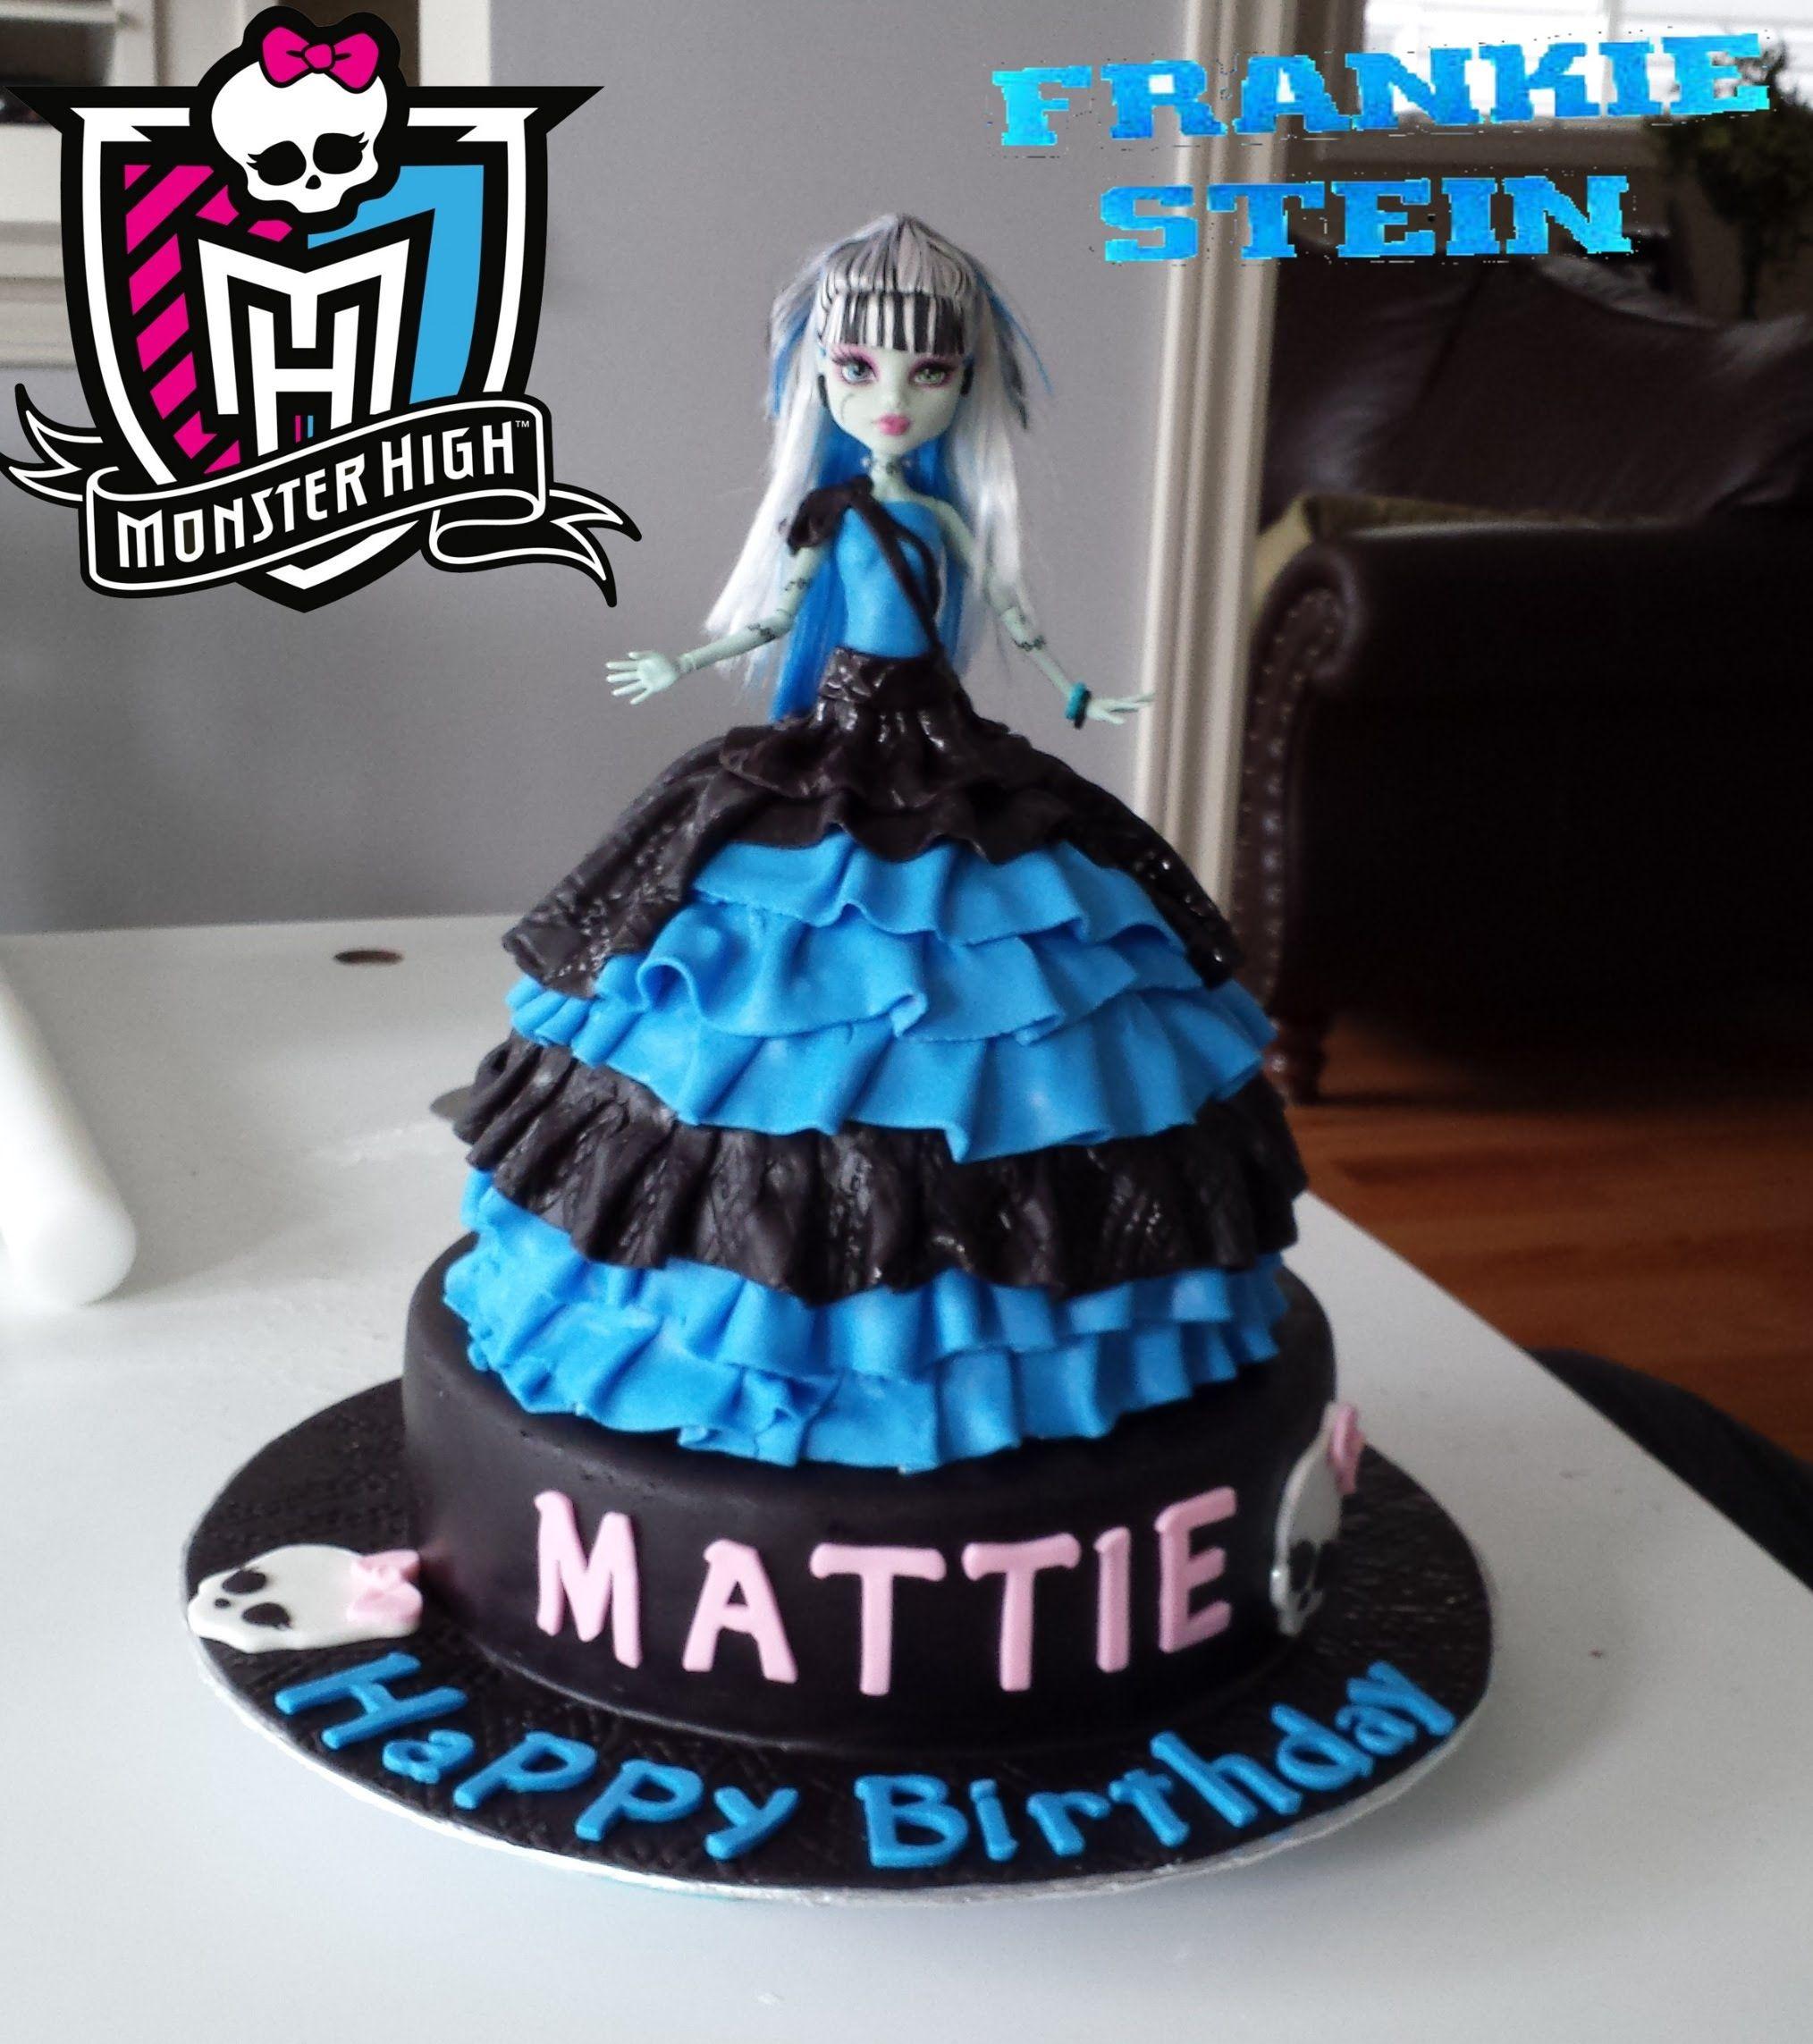 Frankie Stein Monster High Doll Birthday Cake 2014 BABIES